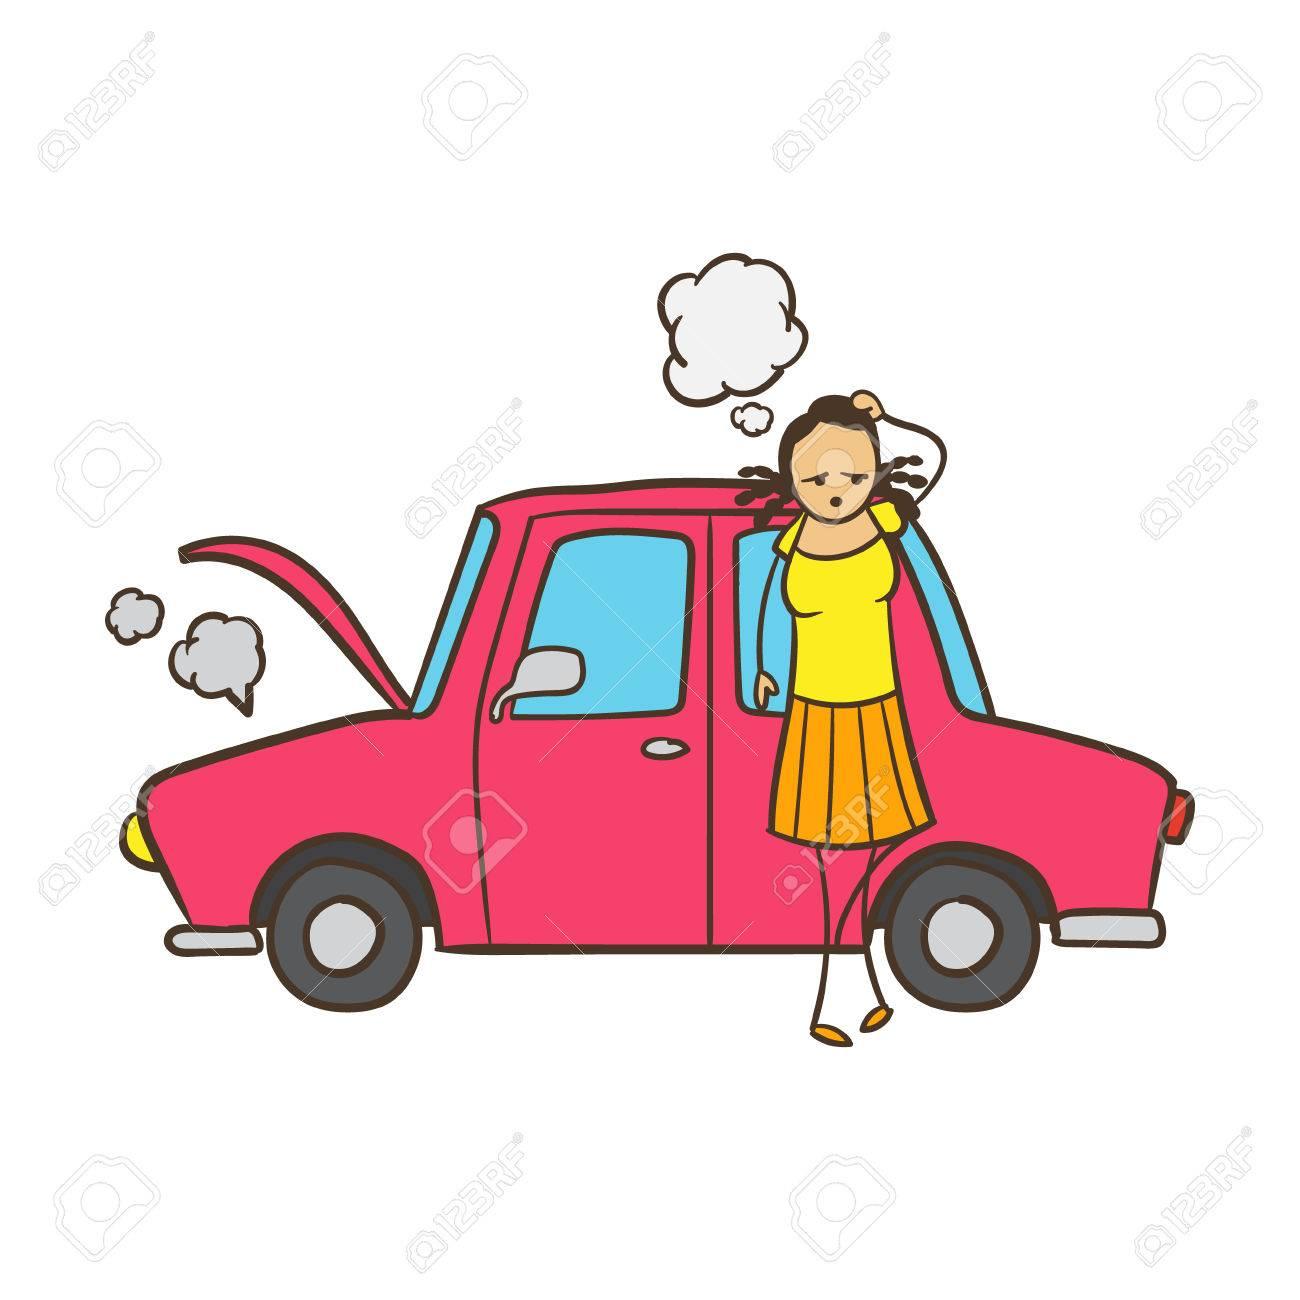 Cartoon Stick Figure Woman With Broken Down Car.